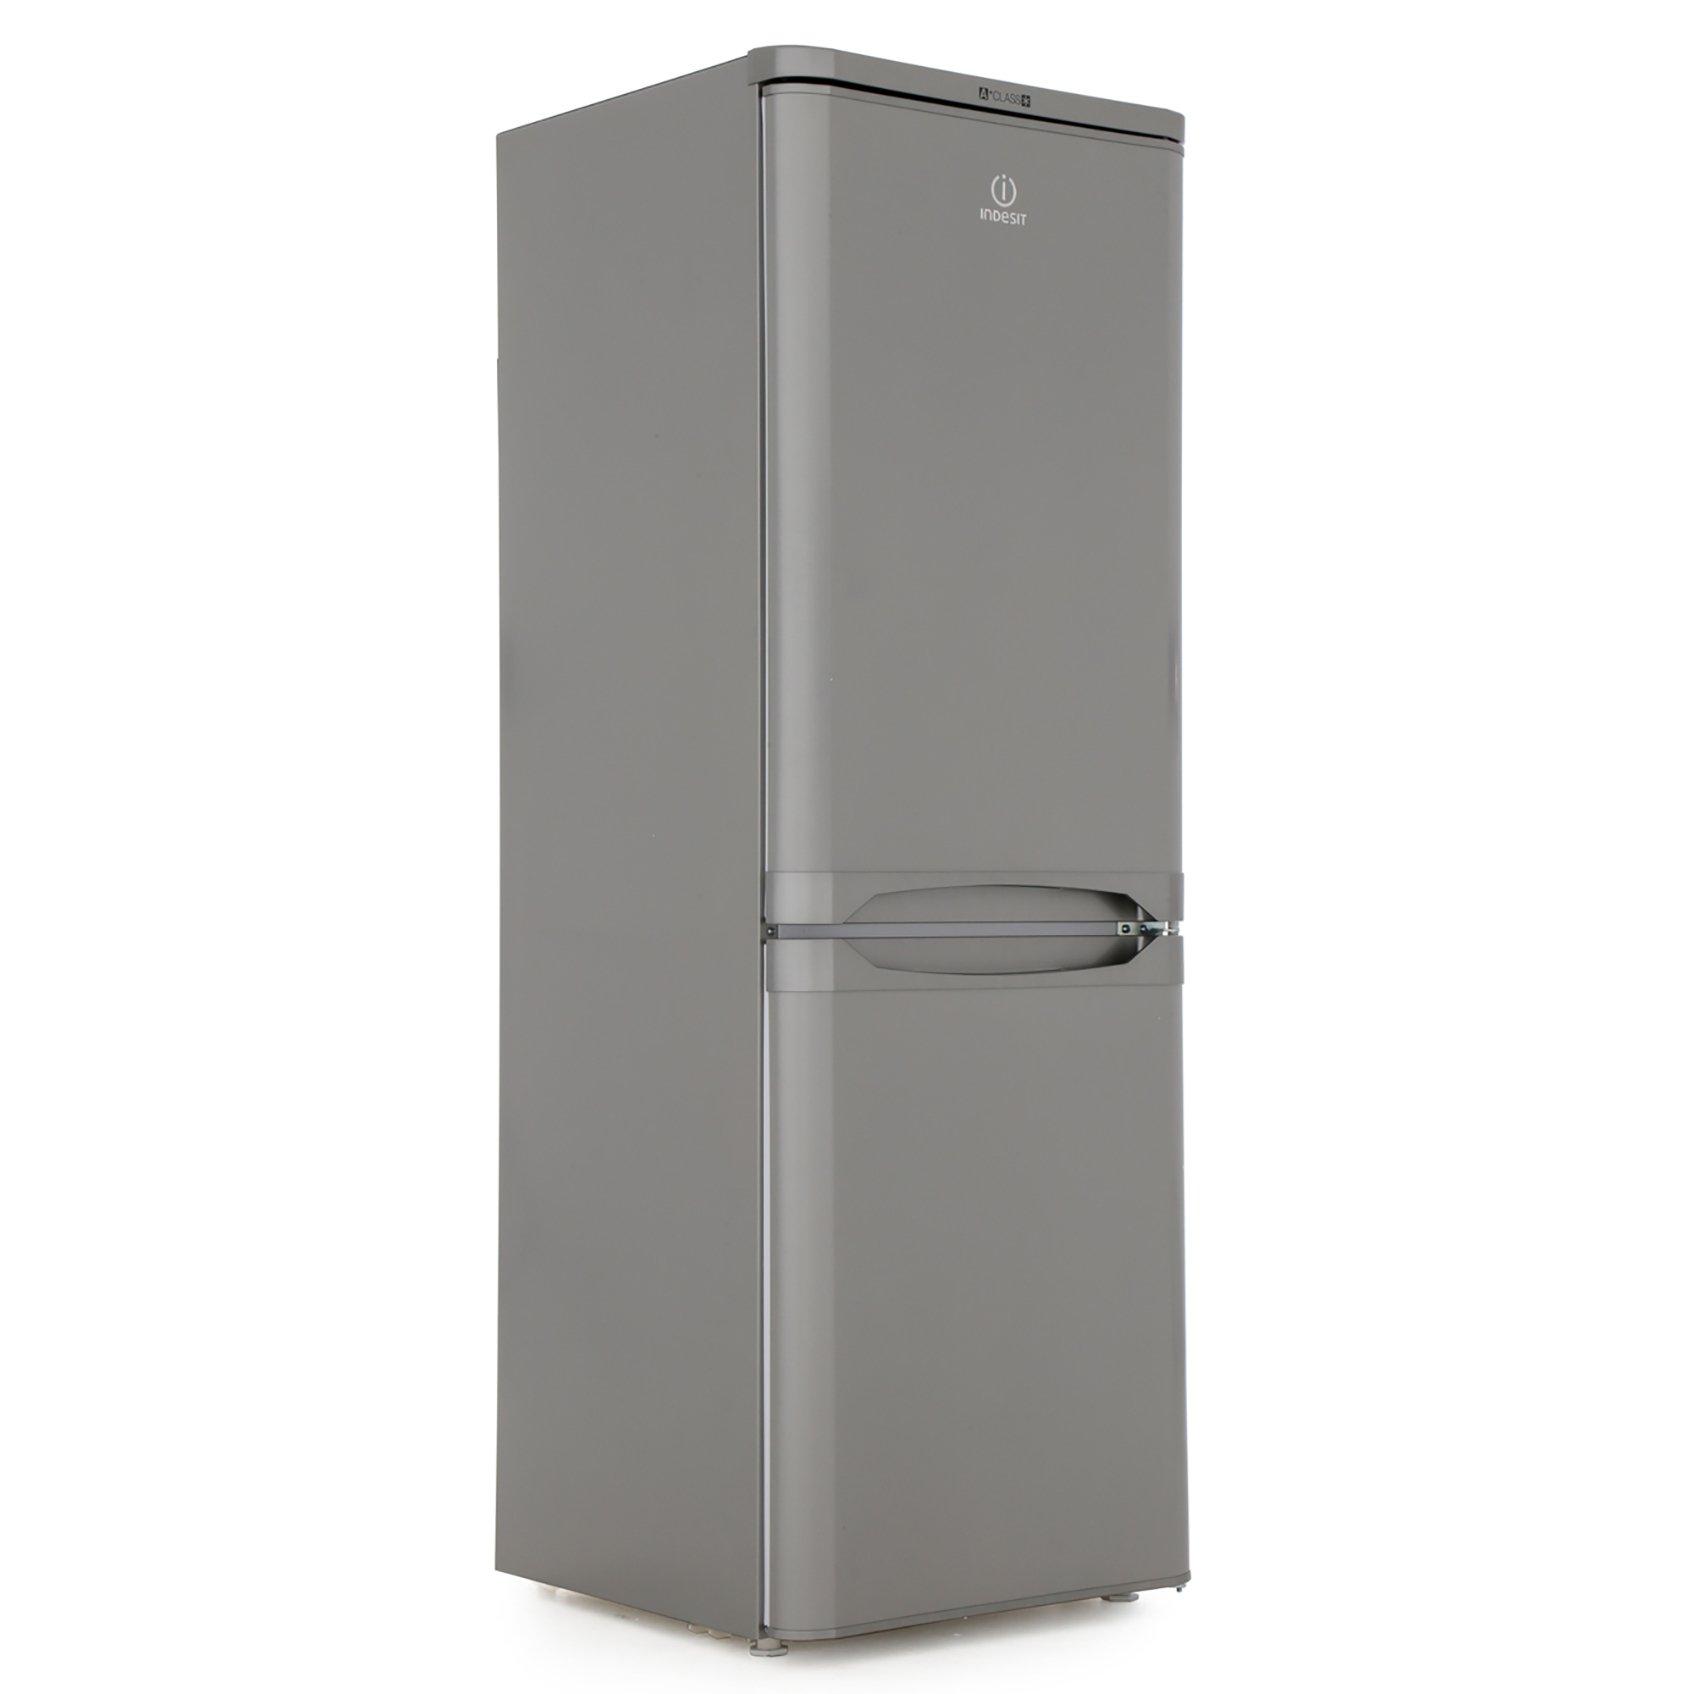 Indesit IBD 5515 S UK Low Frost Fridge Freezer